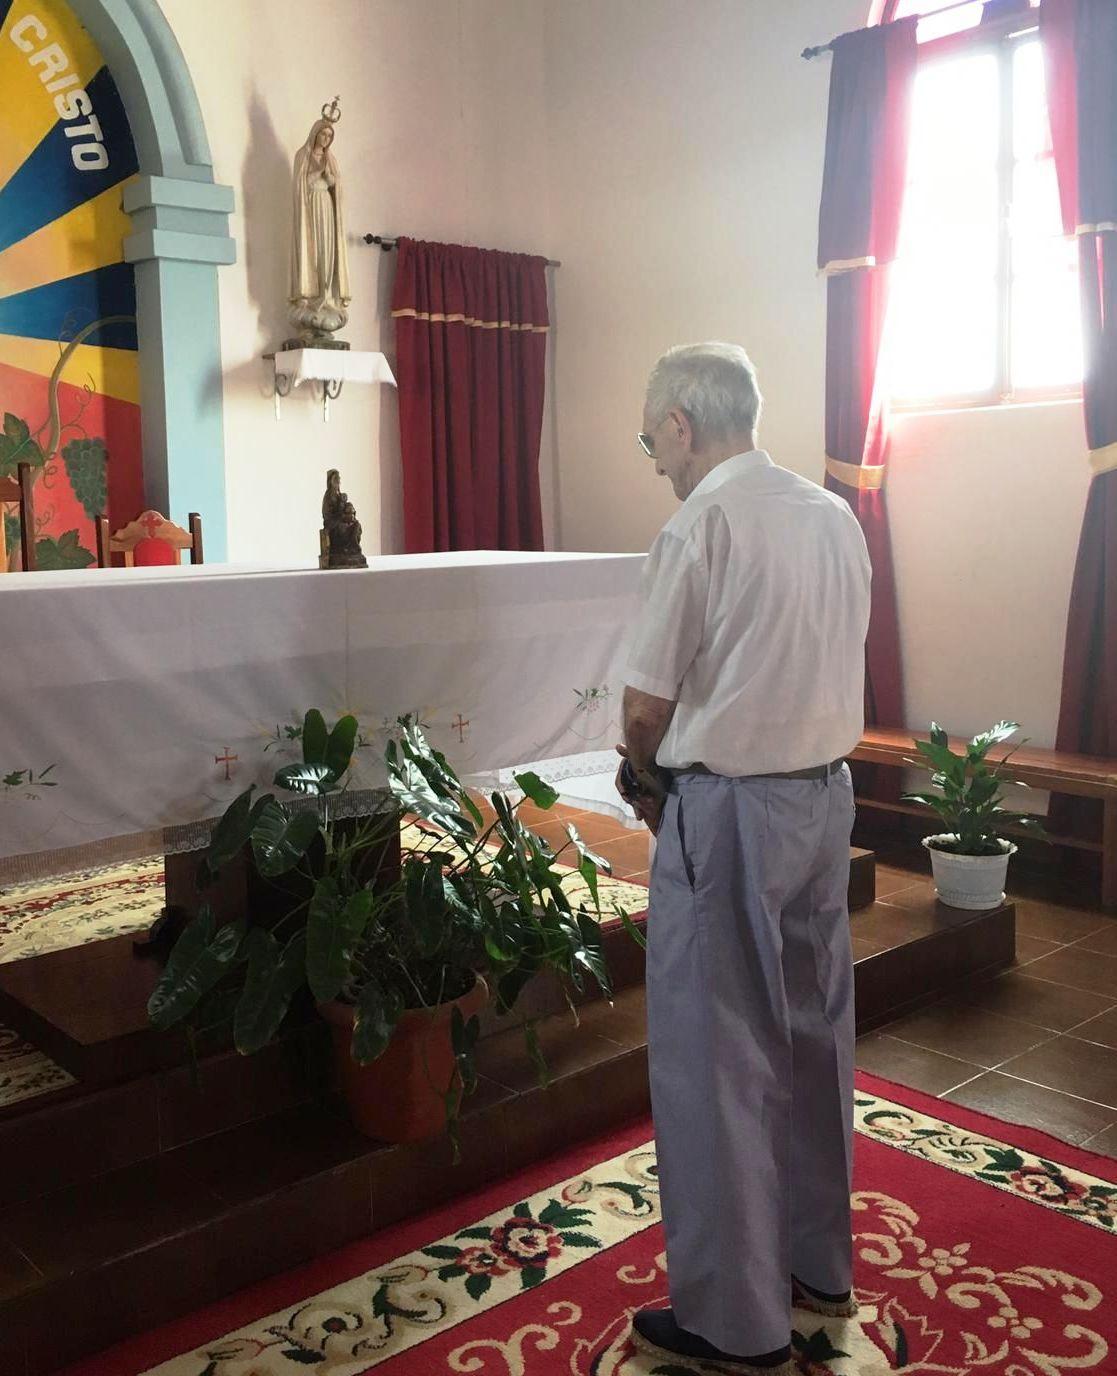 Modesto de Pérdigo en la iglesia de Espargos, isla de Sal